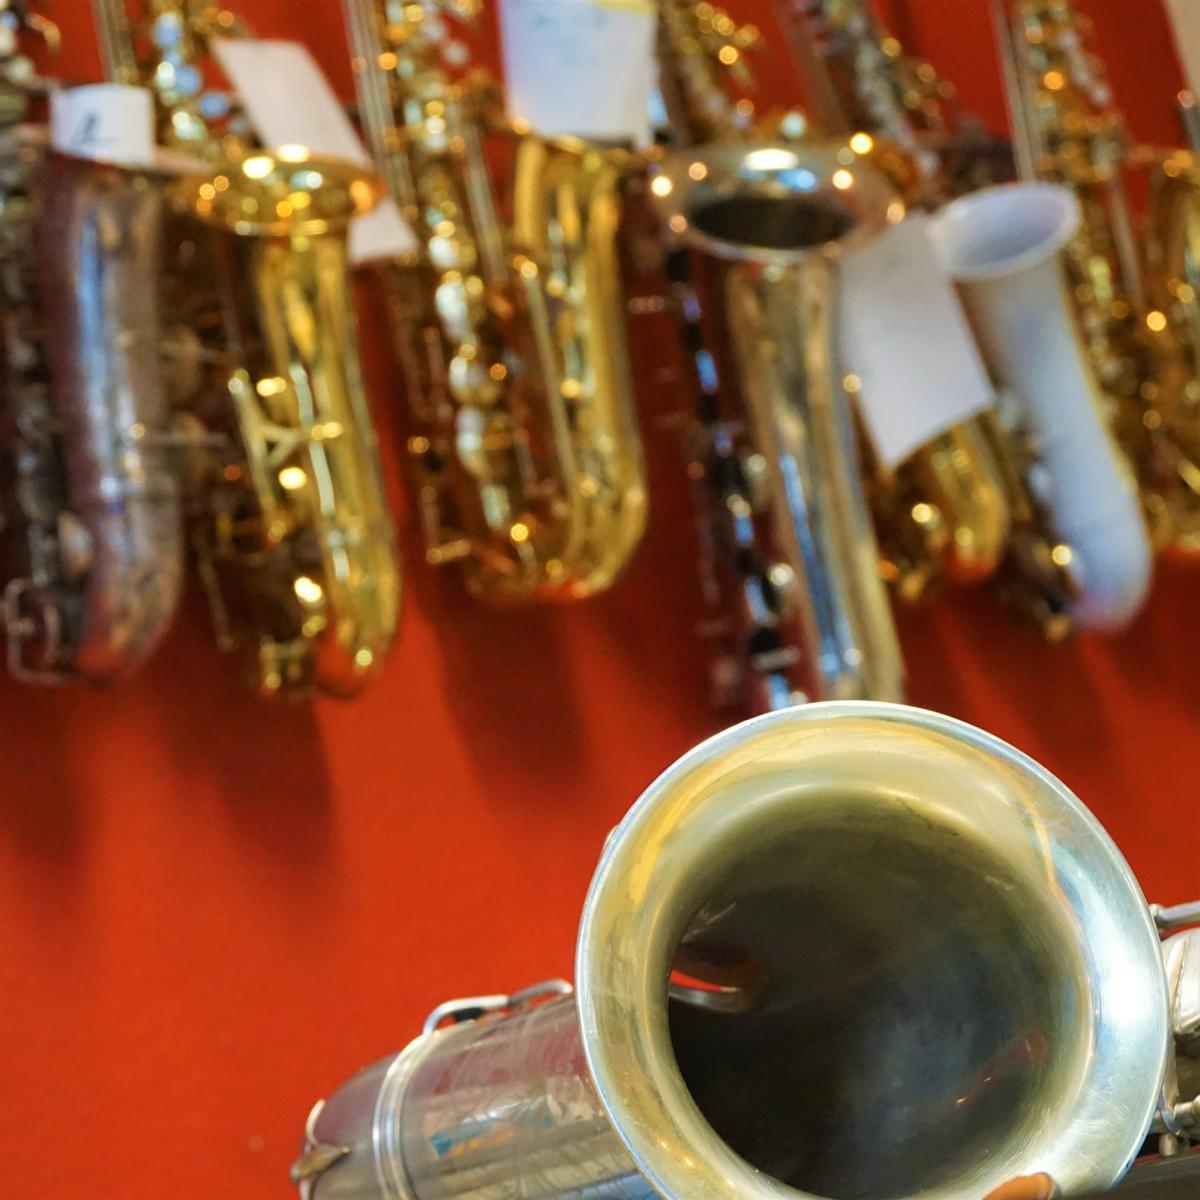 Style Hannover musimiet B1 - Musimiet: Probier' doch mal ein Instrument!